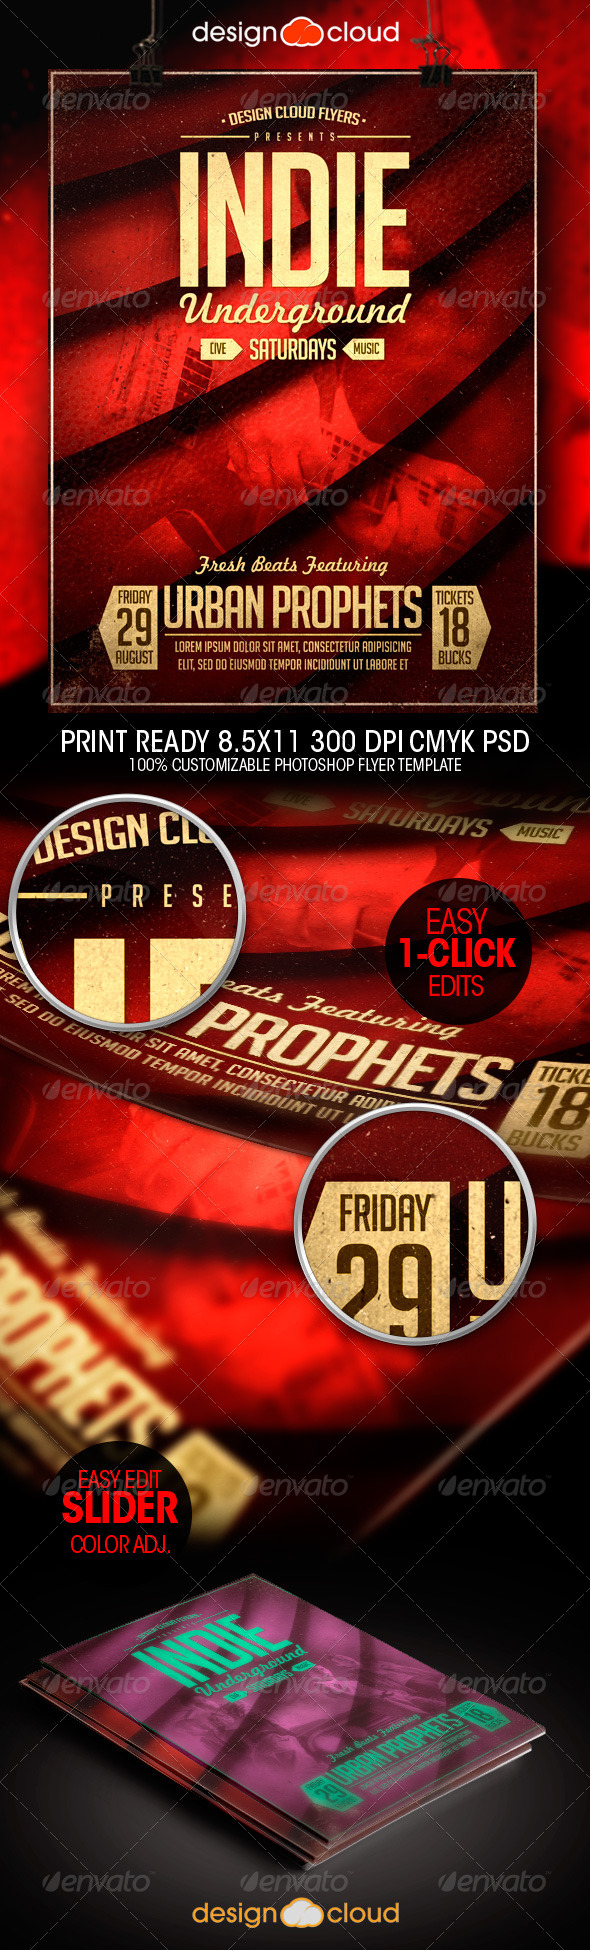 GraphicRiver Indie Underground Poster Flyer Template 8638928